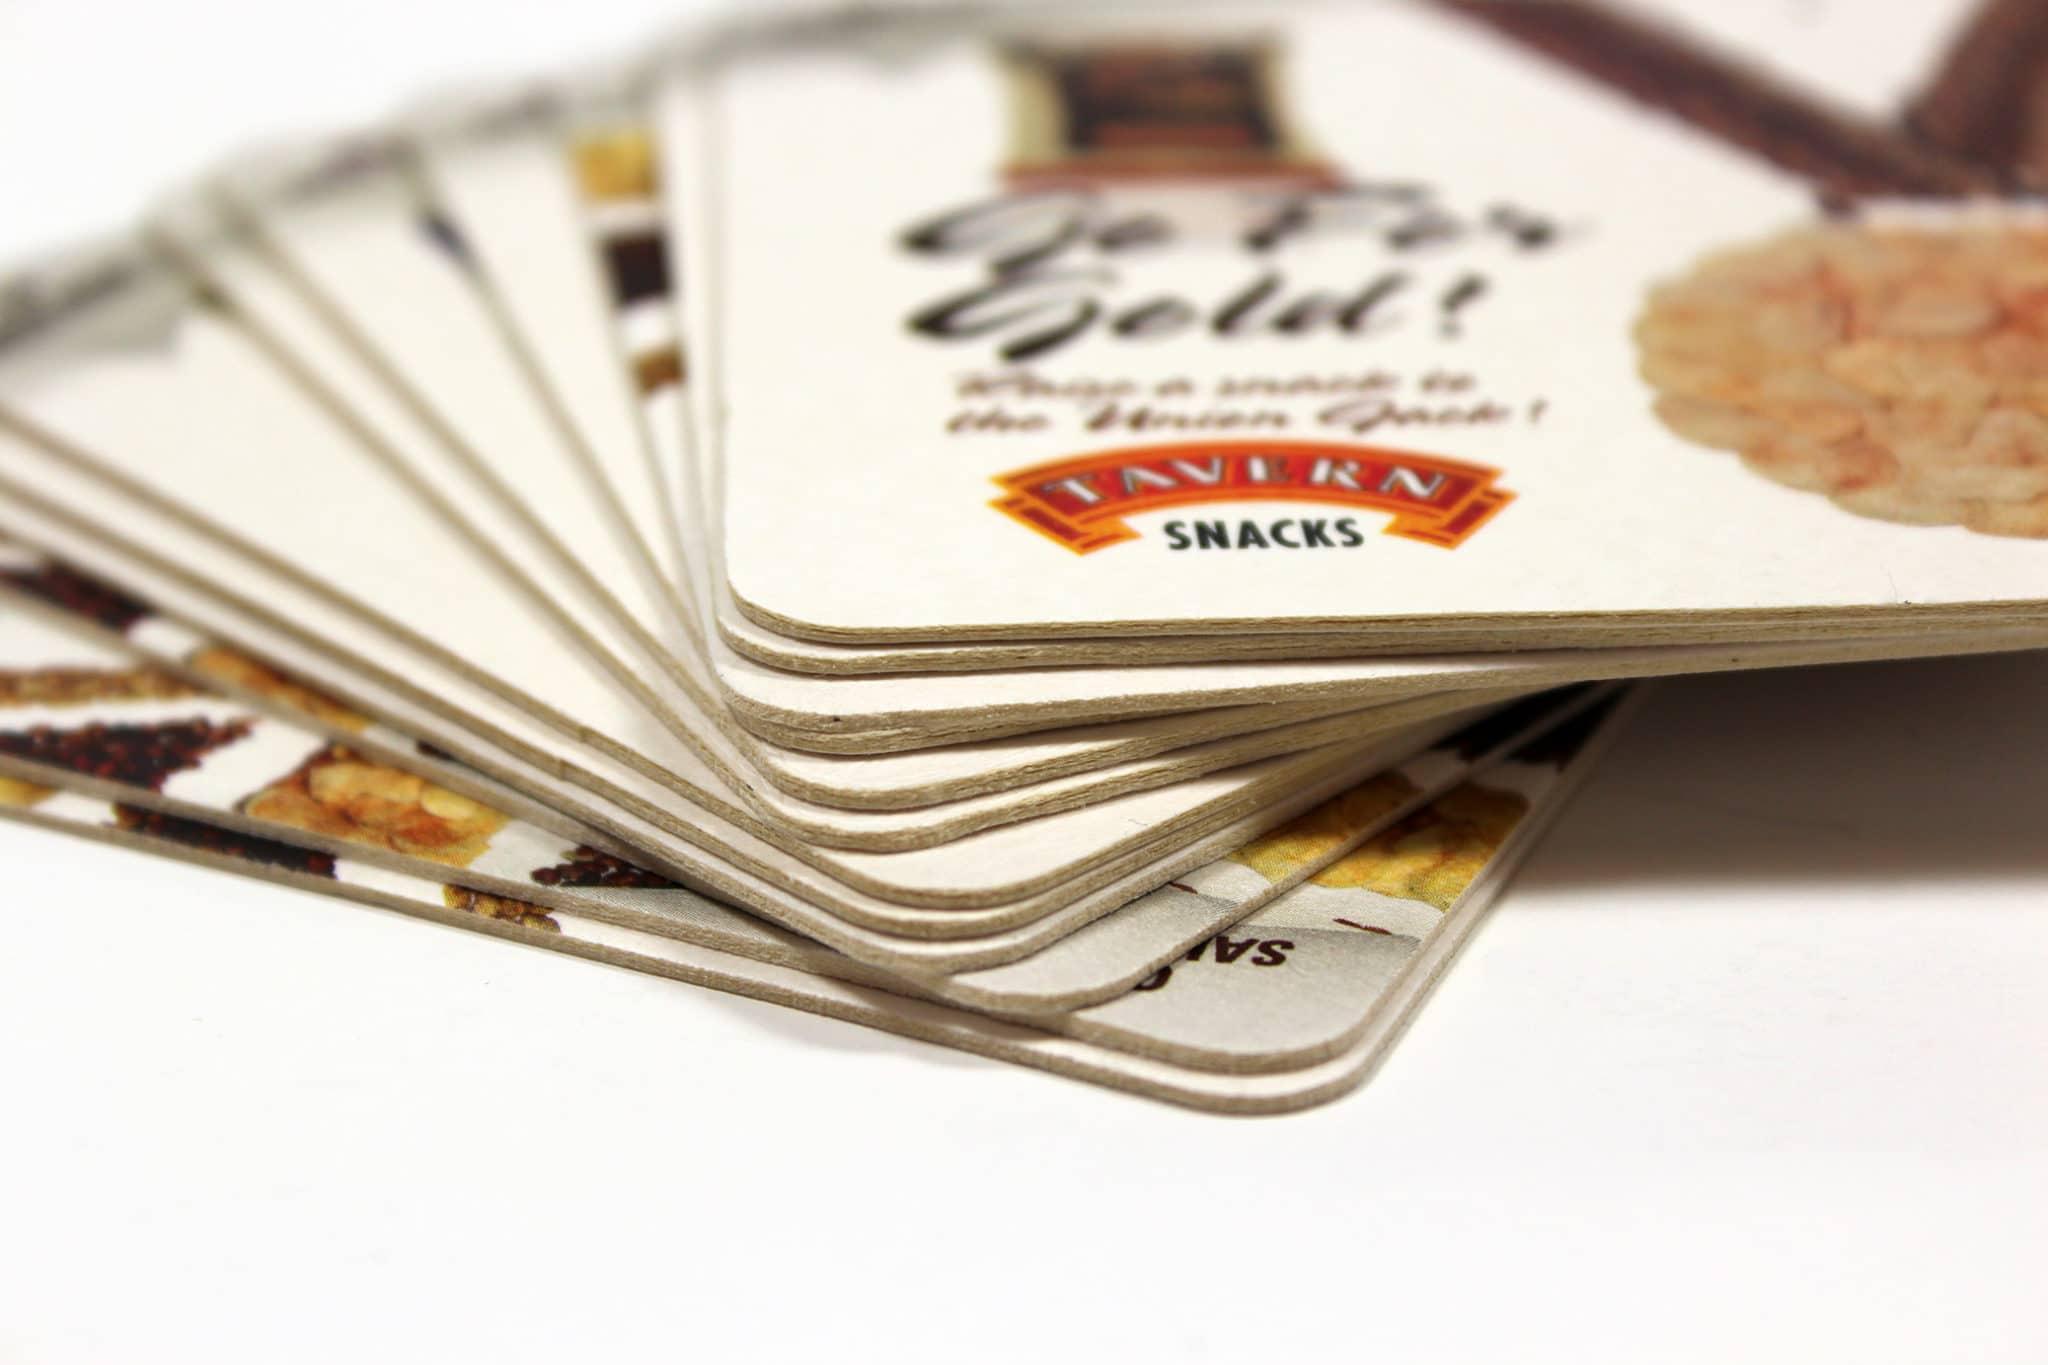 Super-absorbent, environmentally friendly beer mat printing